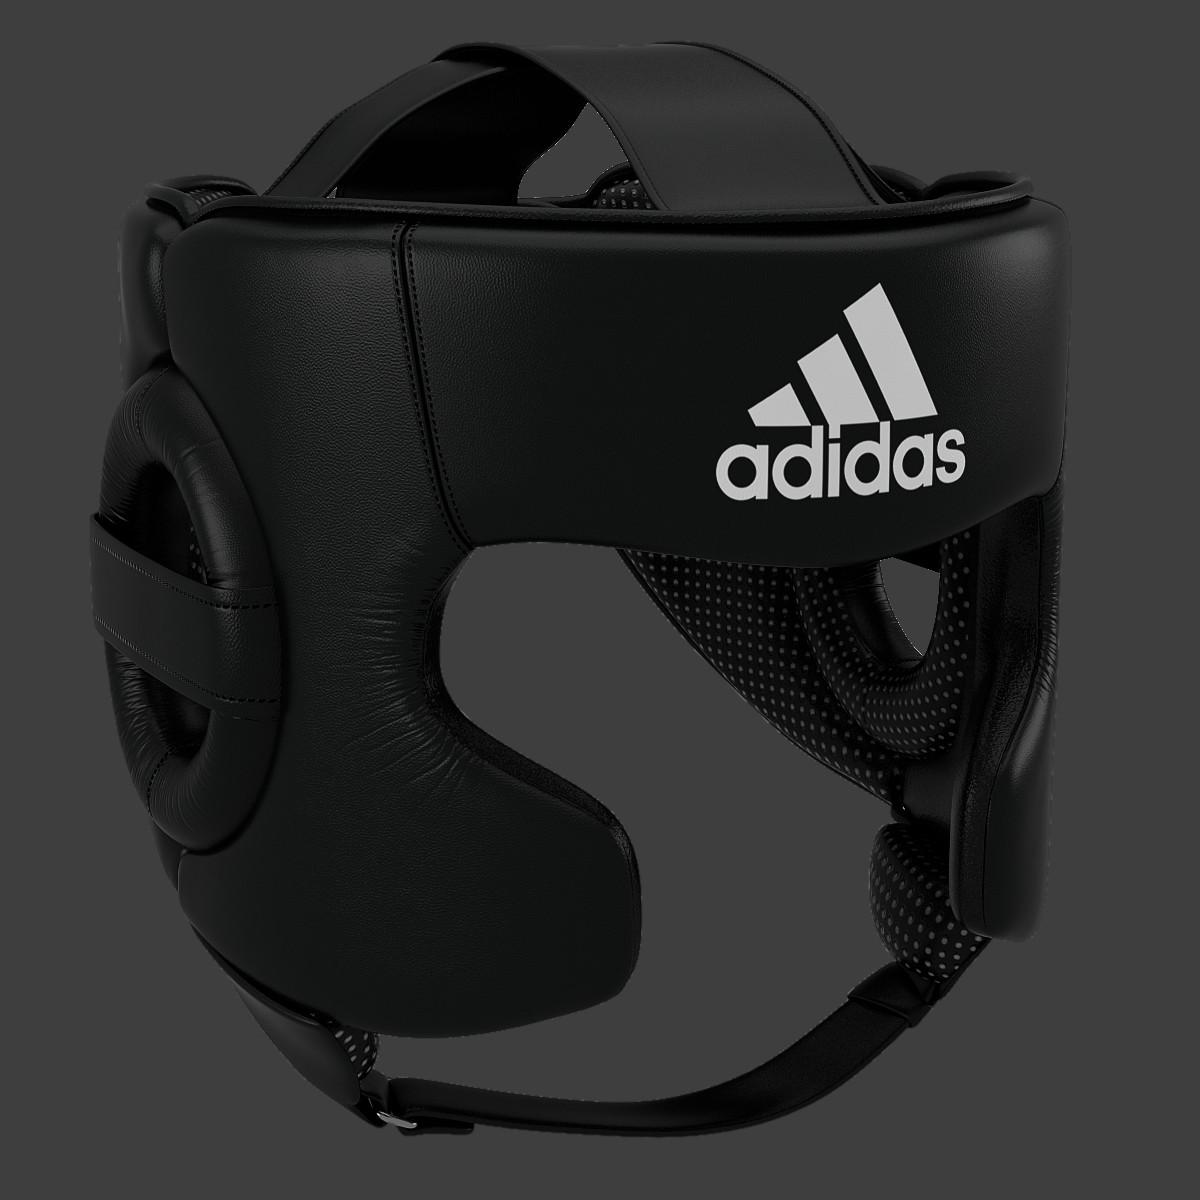 headguard_adidas_01.jpg